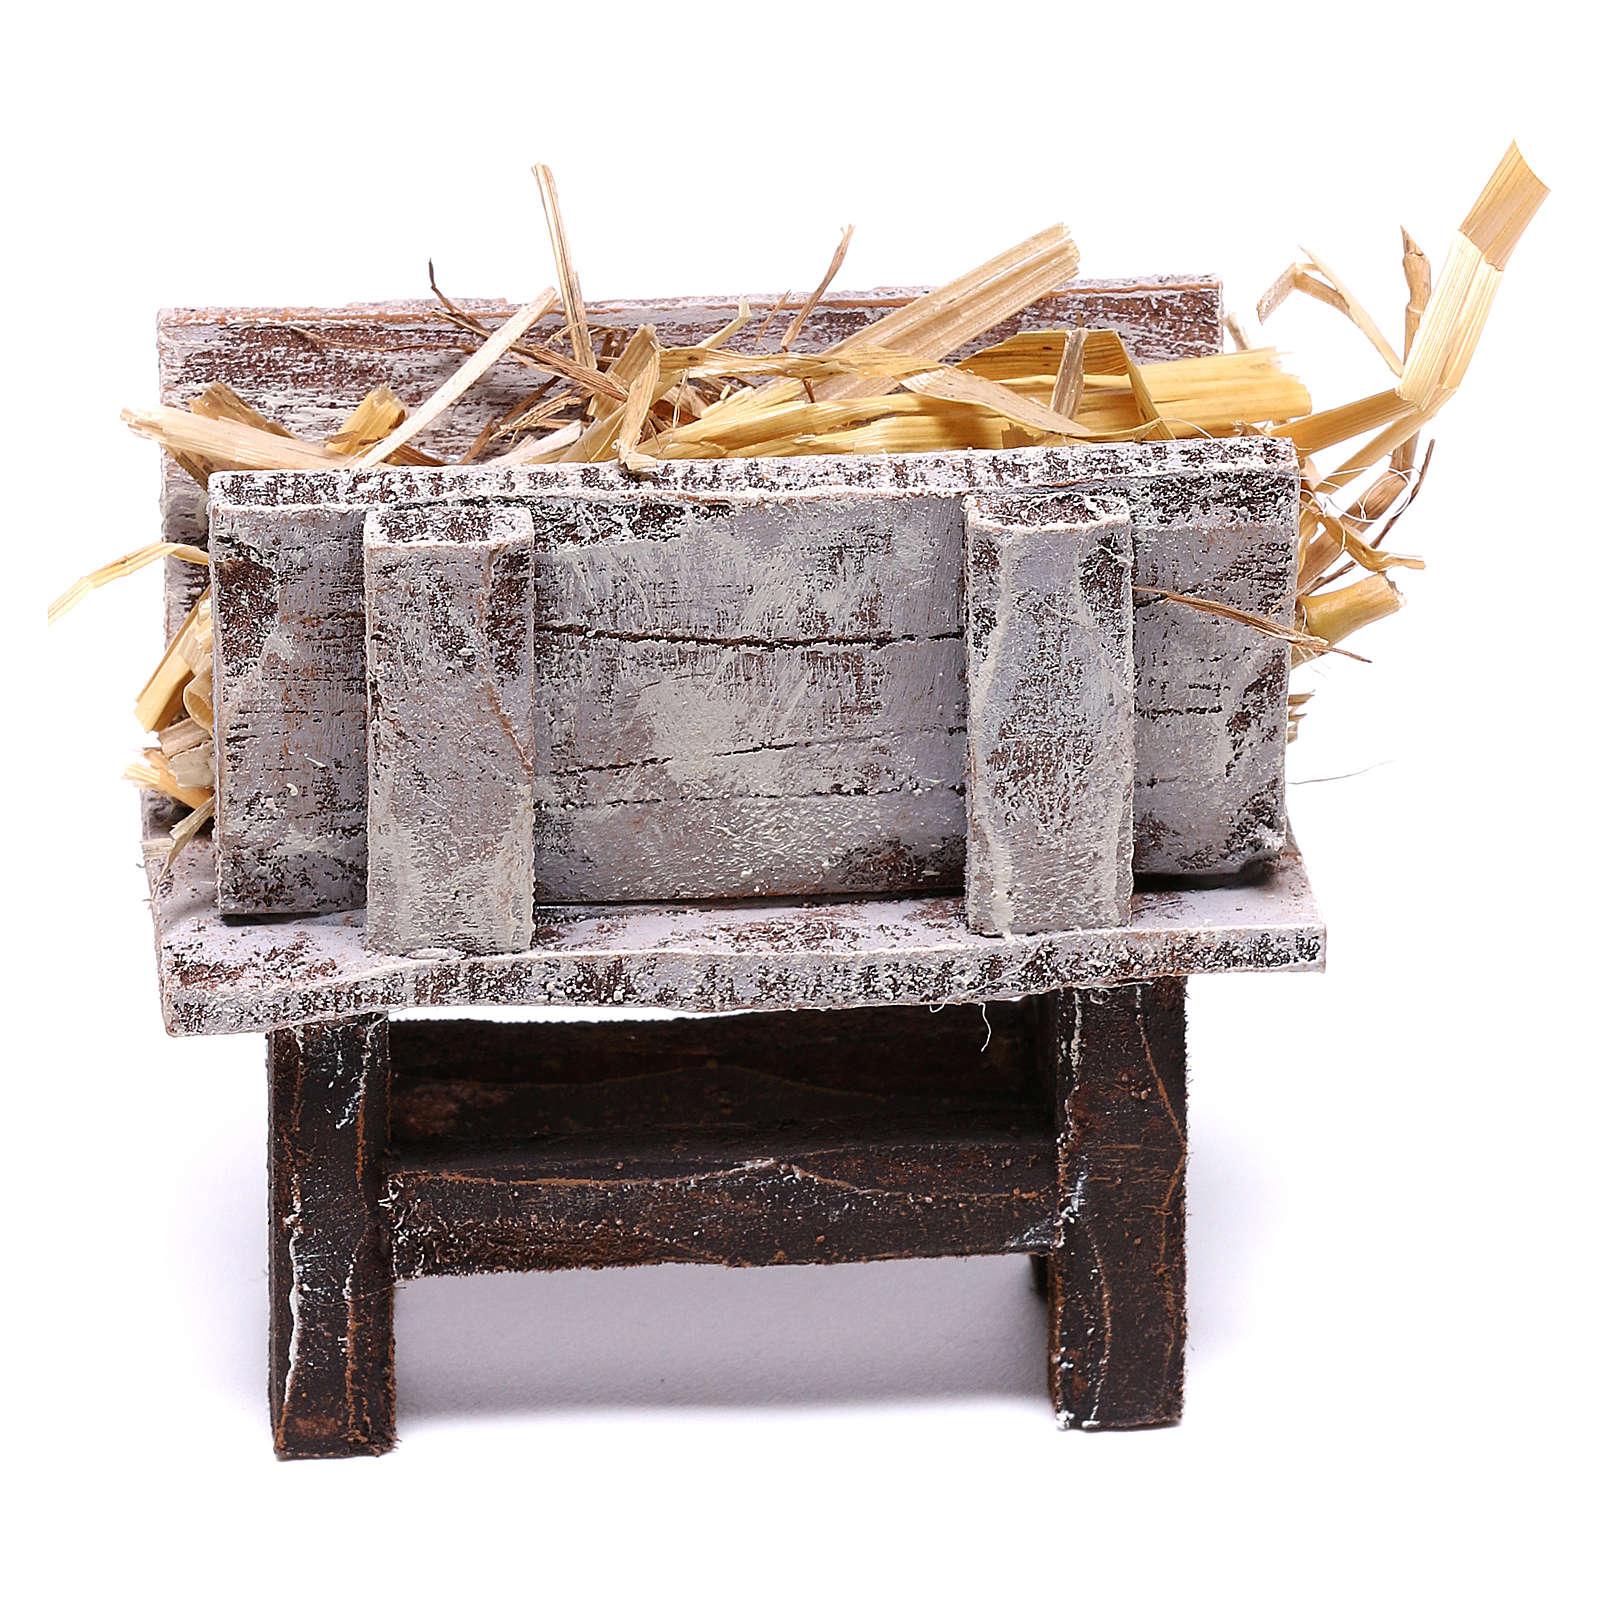 Mini trough 5x5x5 cm, for 10 cm nativity 4